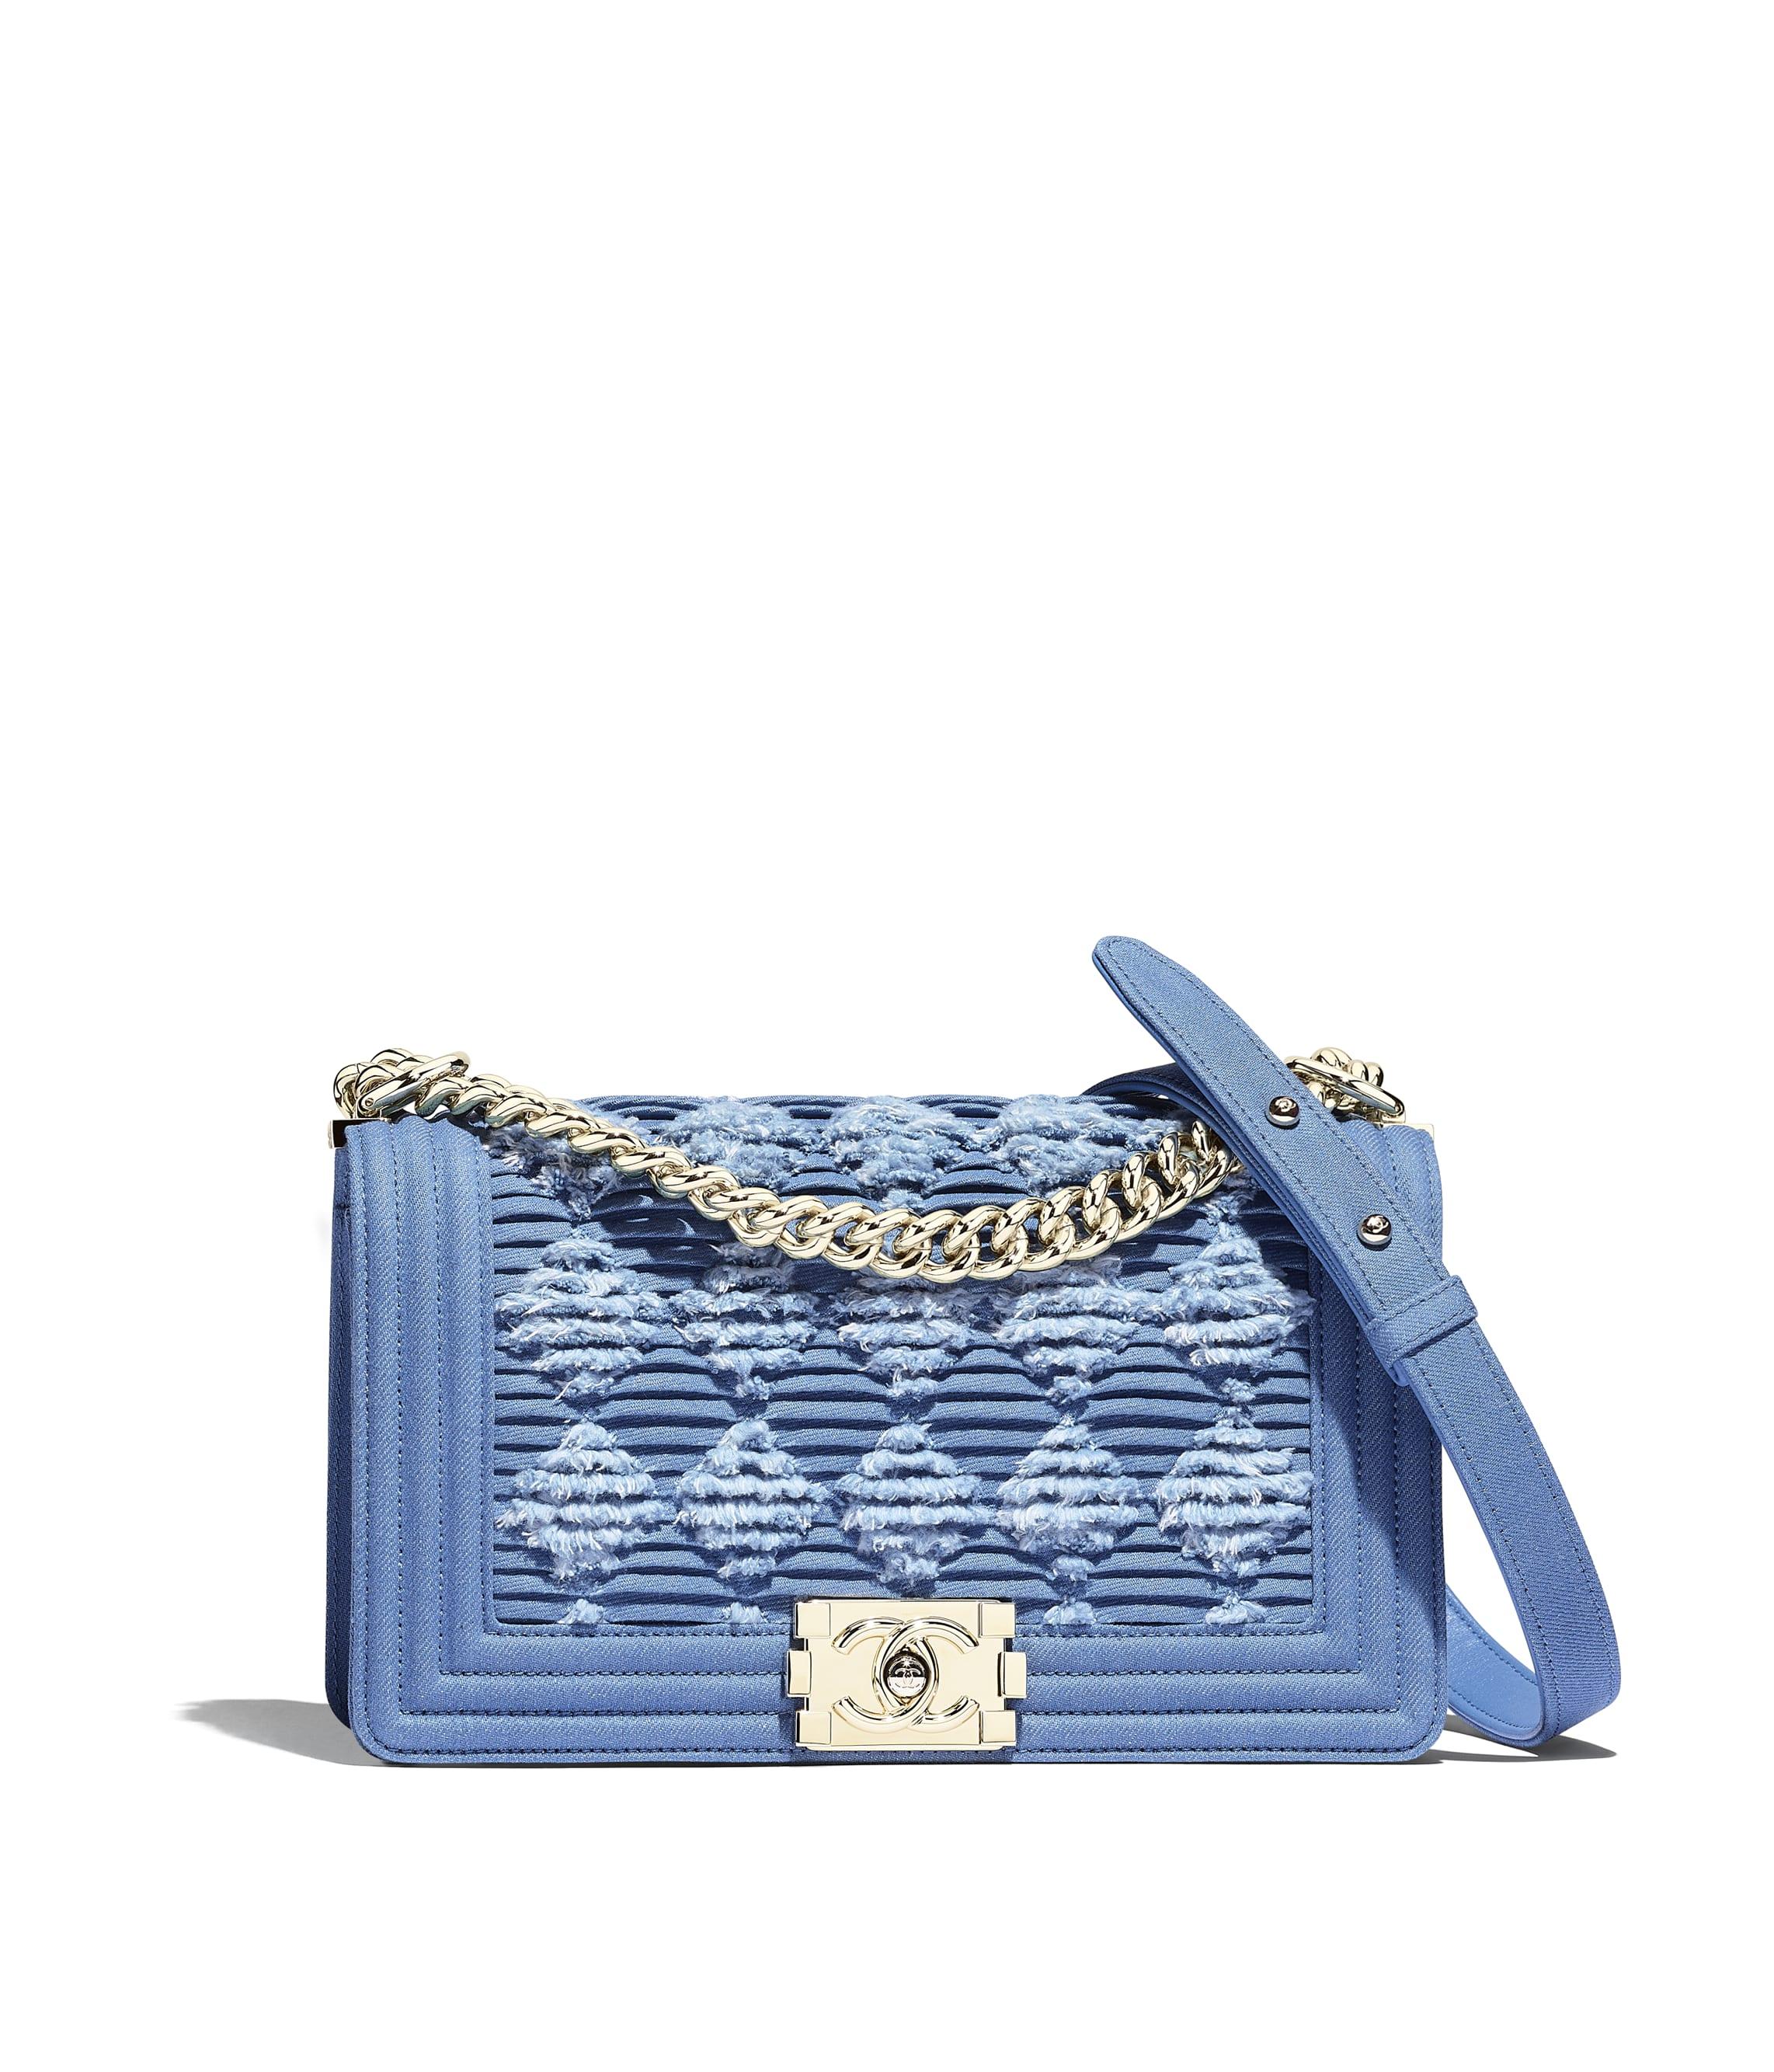 4978ee6d8fbb BOY CHANEL - Handbags - CHANEL